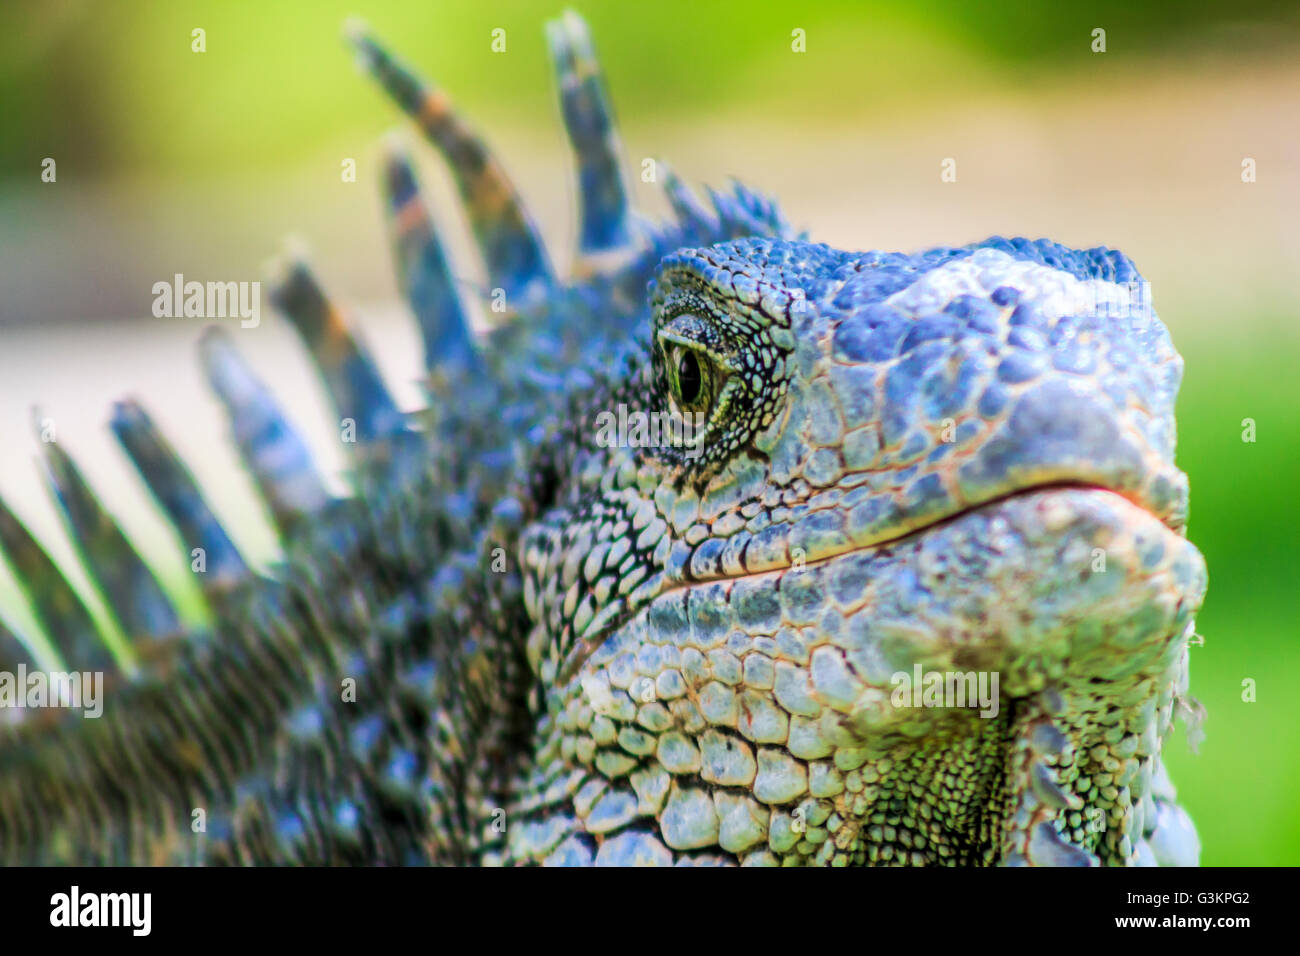 Close up of male green iguana (iguana Iguana) with spines and dewlap, Parque de las Iguanas, Guayaquil, Ecuador - Stock Image